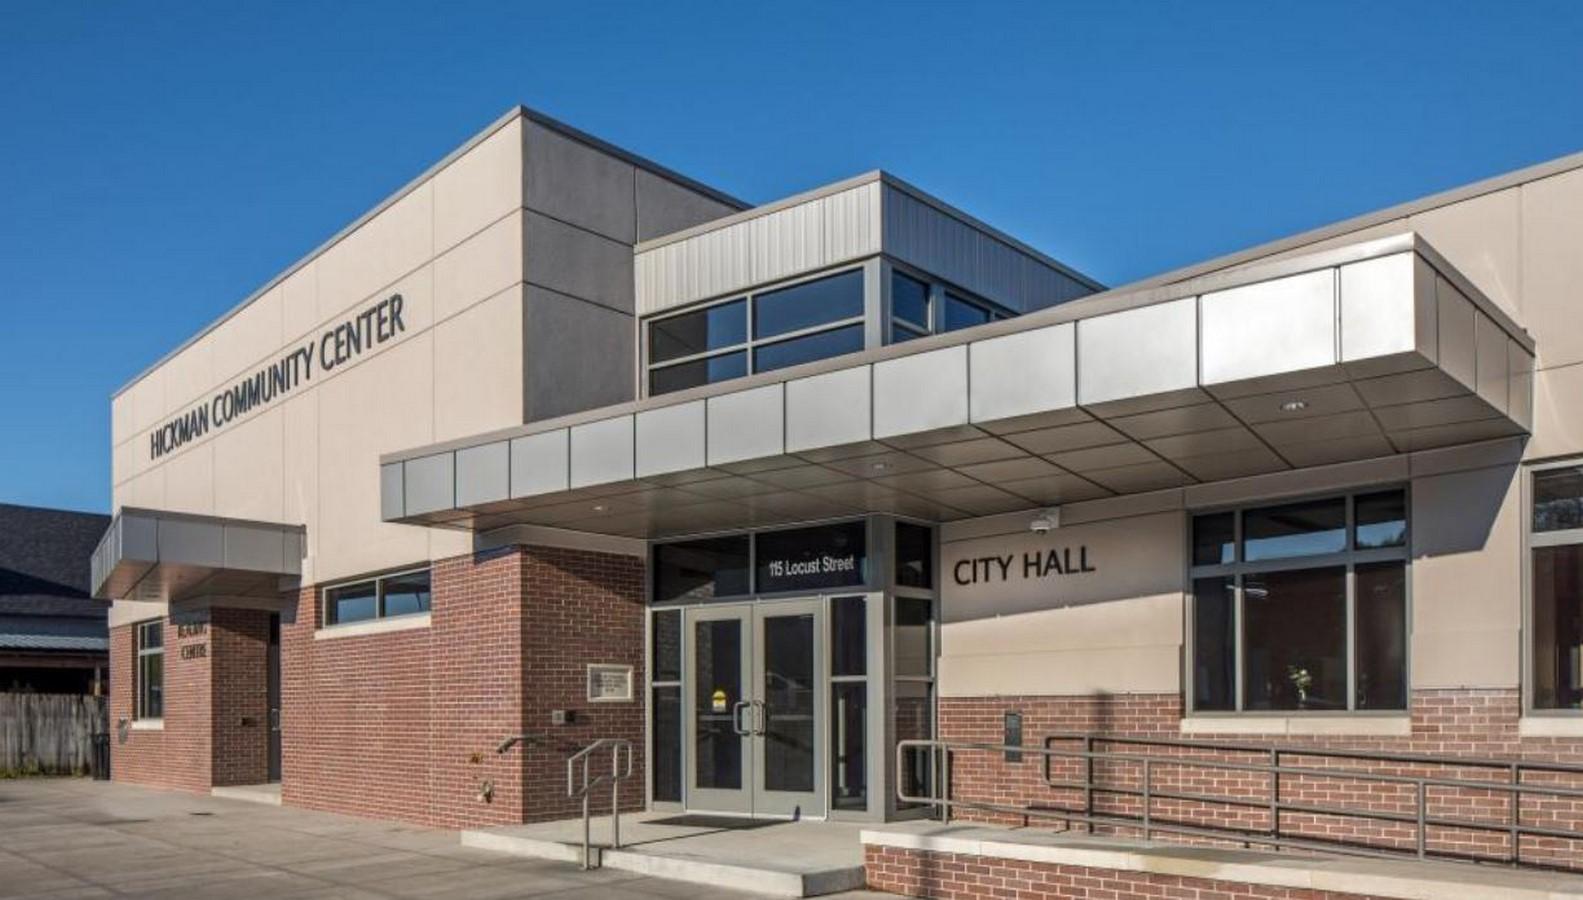 Architects in Omaha - Top 45 Architects in Omaha - Sheet25